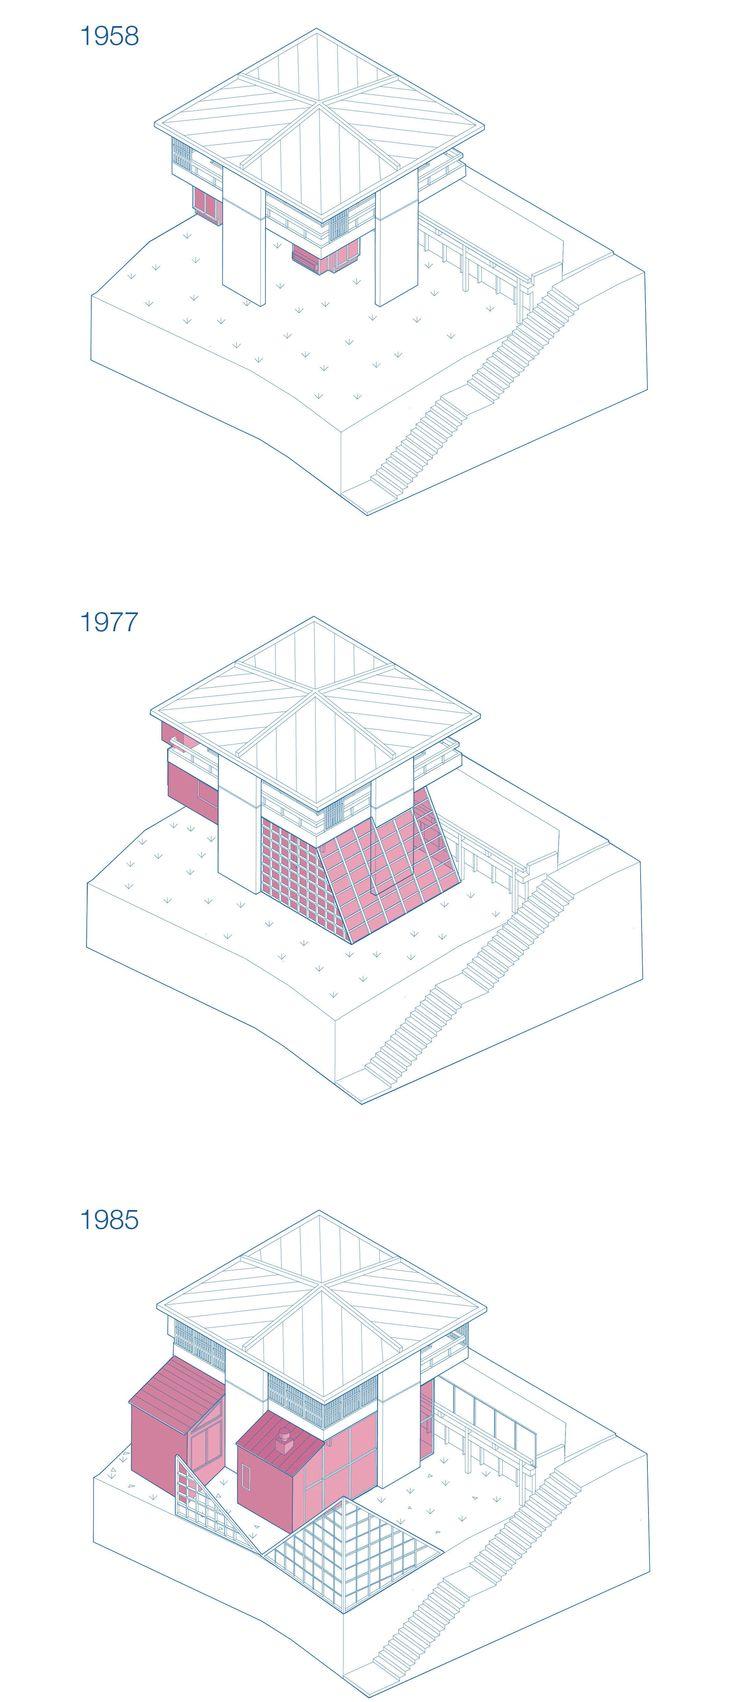 Kikutake - sky house . ad hoc growth over the years